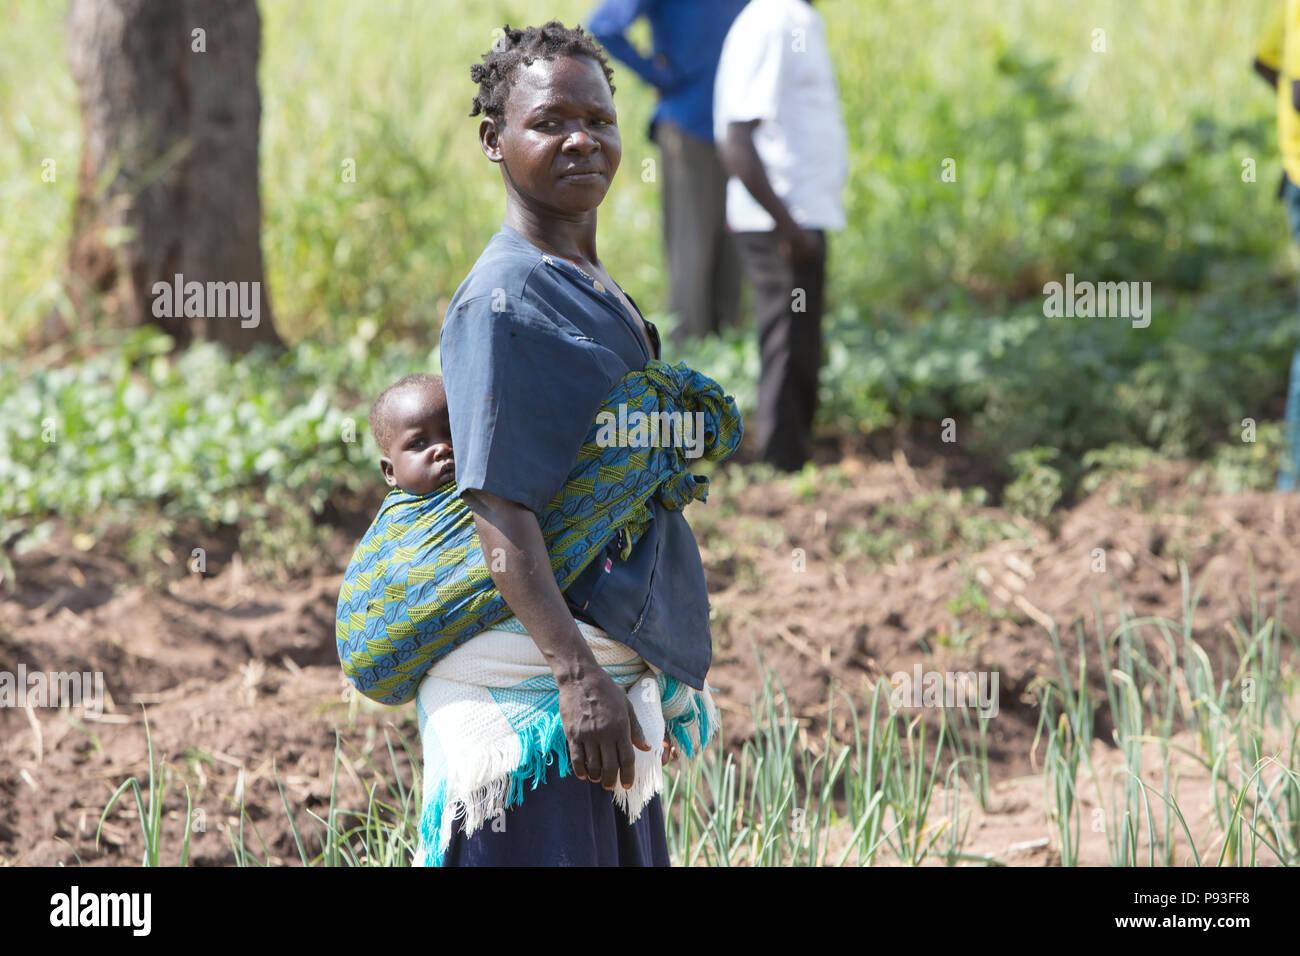 Adjumani, Uganda - National self-help progetto di aiuti umanitari organizzazione Welthungerhilfe. Immagini Stock